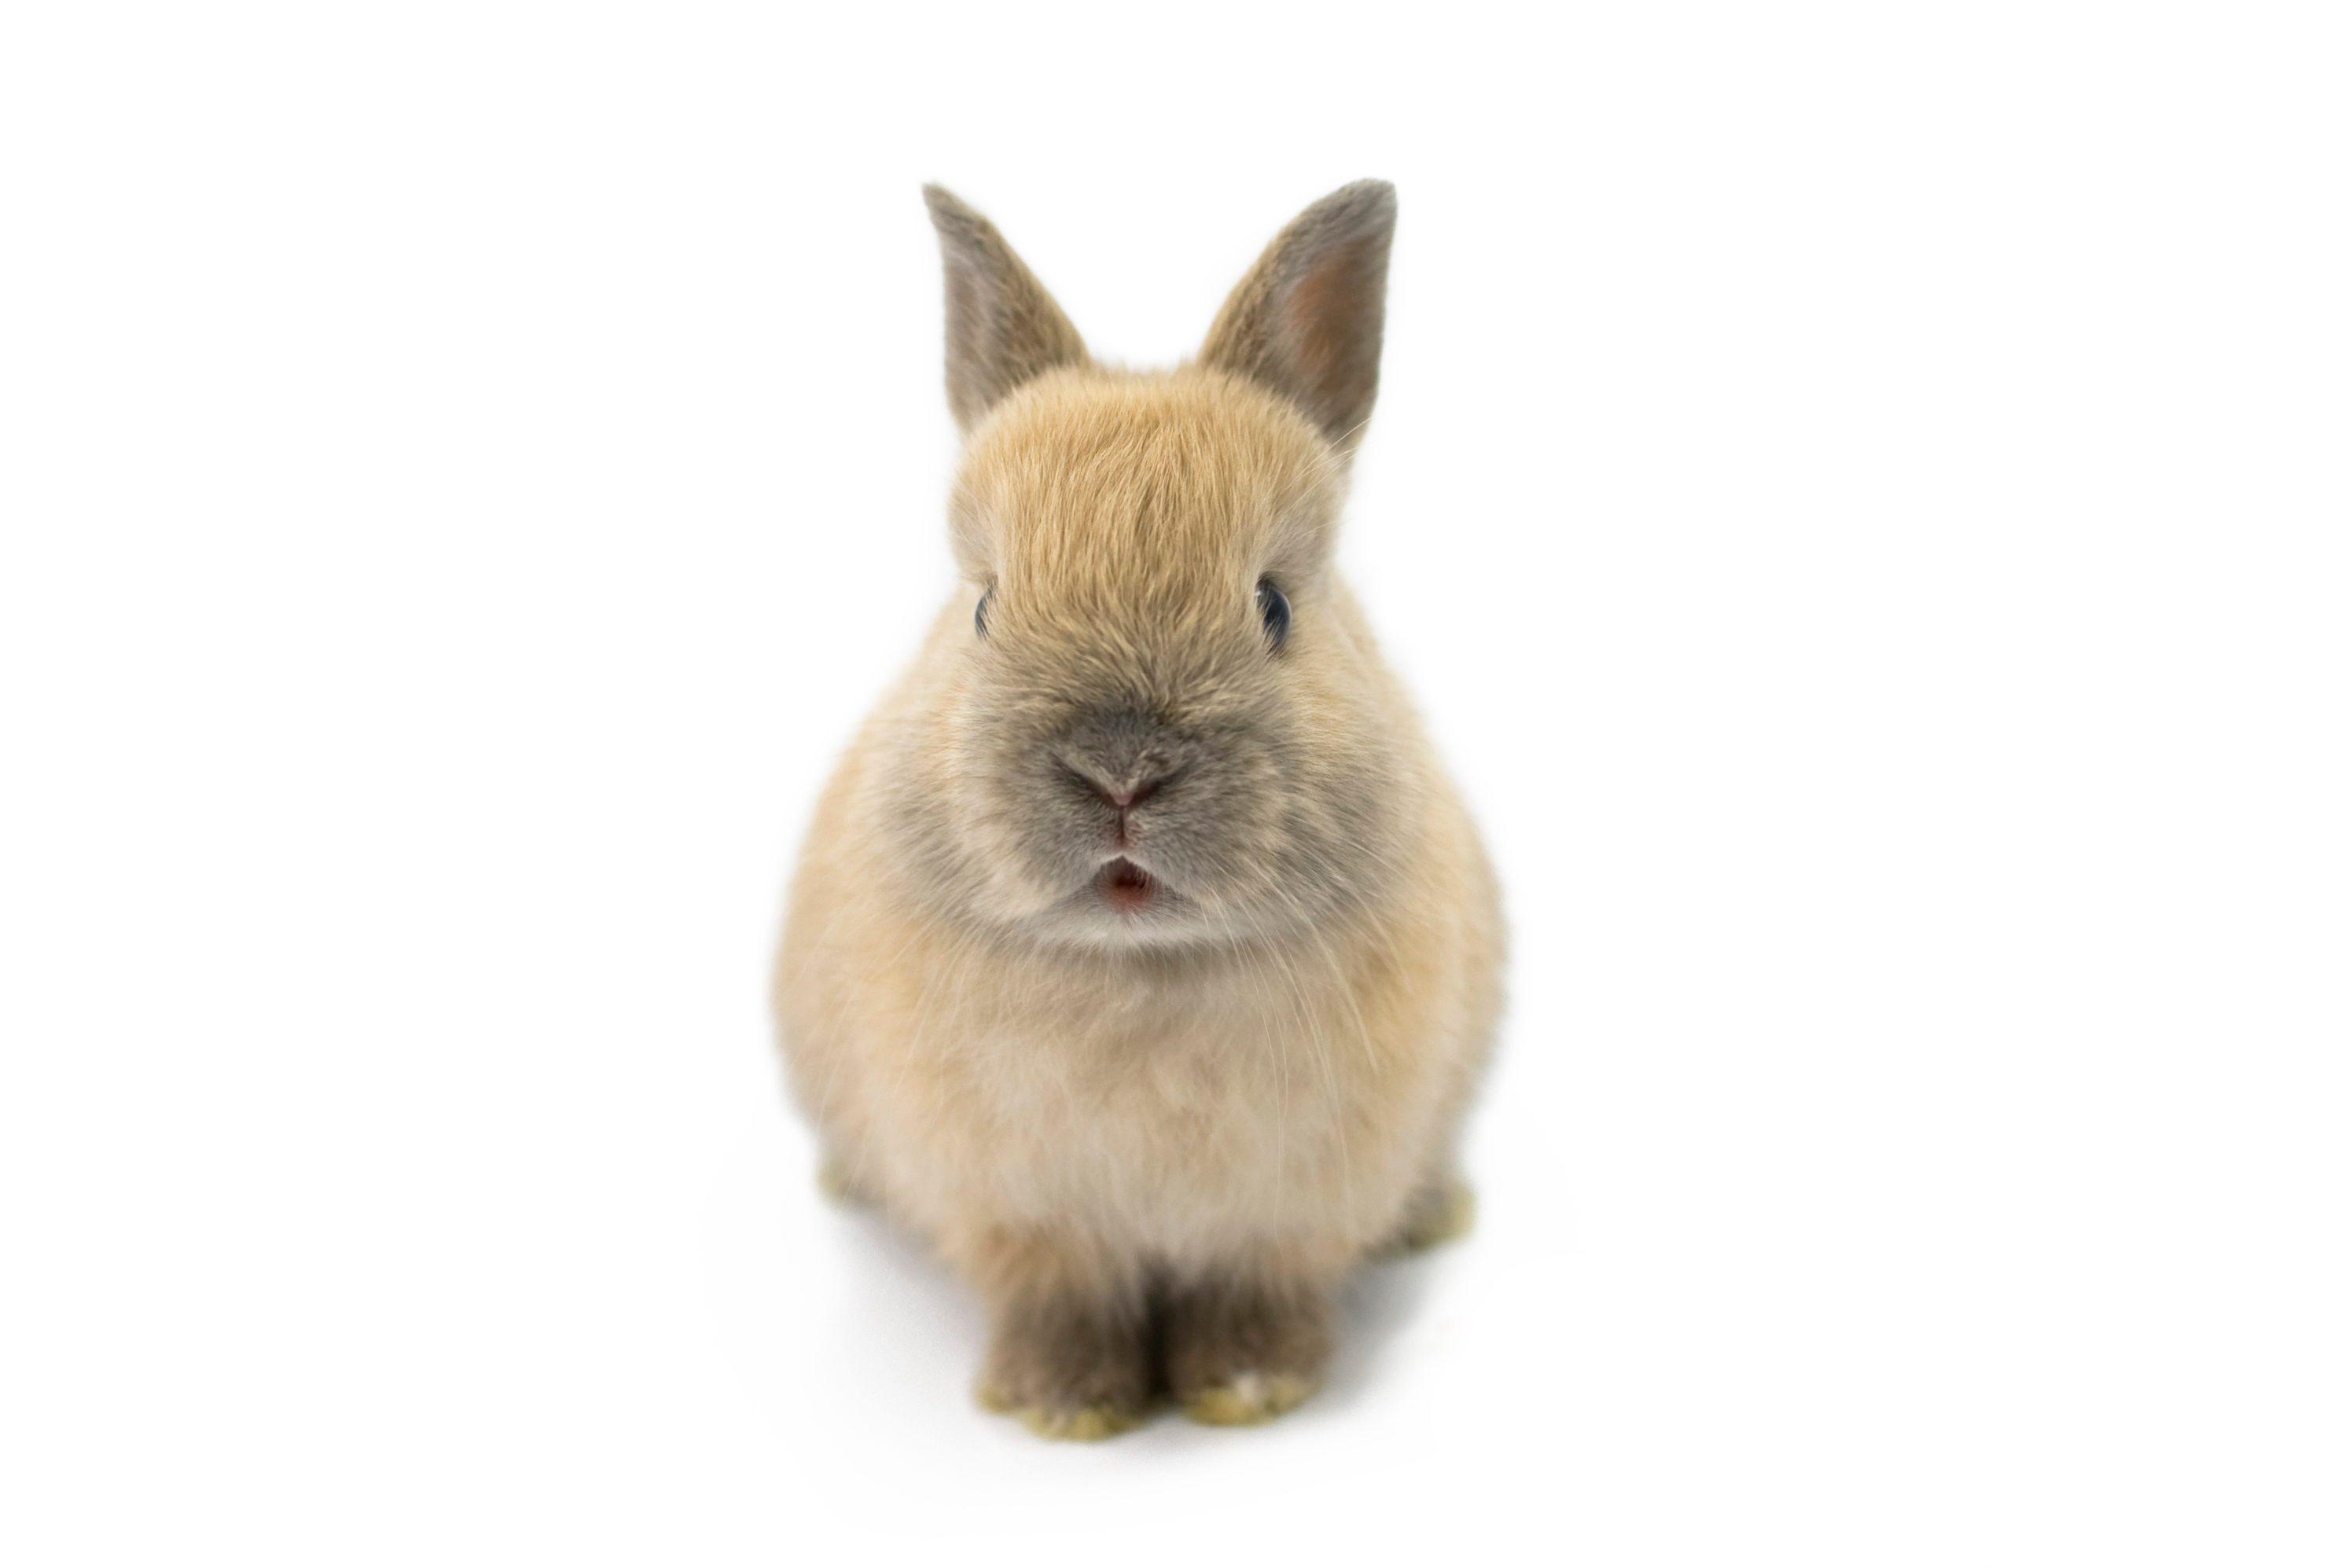 Baby of Netherland Dwarf Rabbit